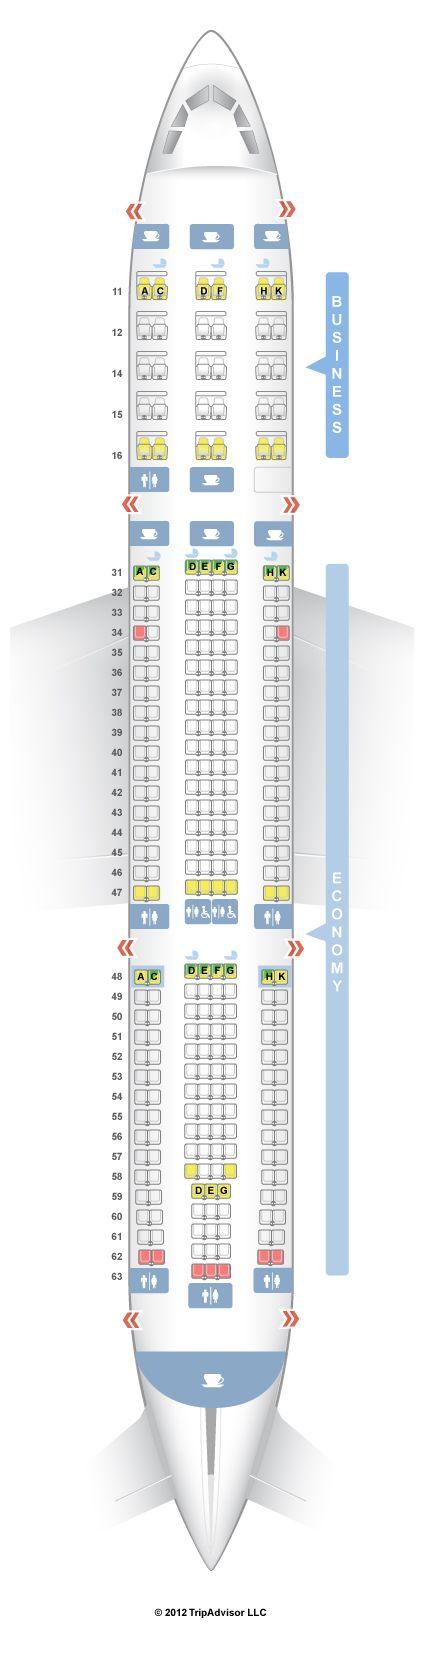 SeatGuru Seat Map Singapore Airlines Airbus A330-300 (333) | Travel ...